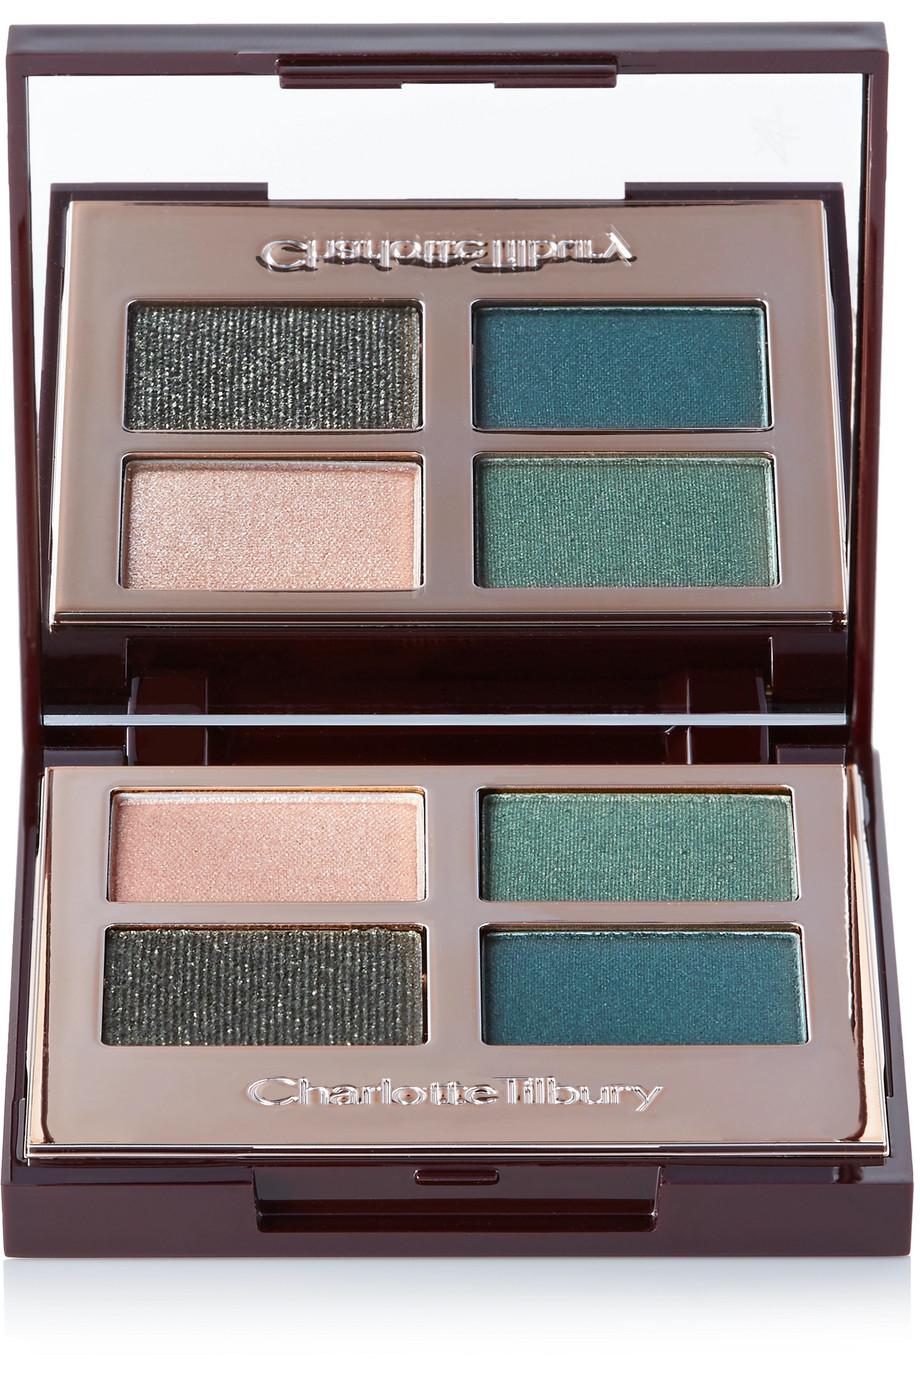 Charlotte Tilbury Luxury Palette Colour-Coded Eye Shadows - The Rebel